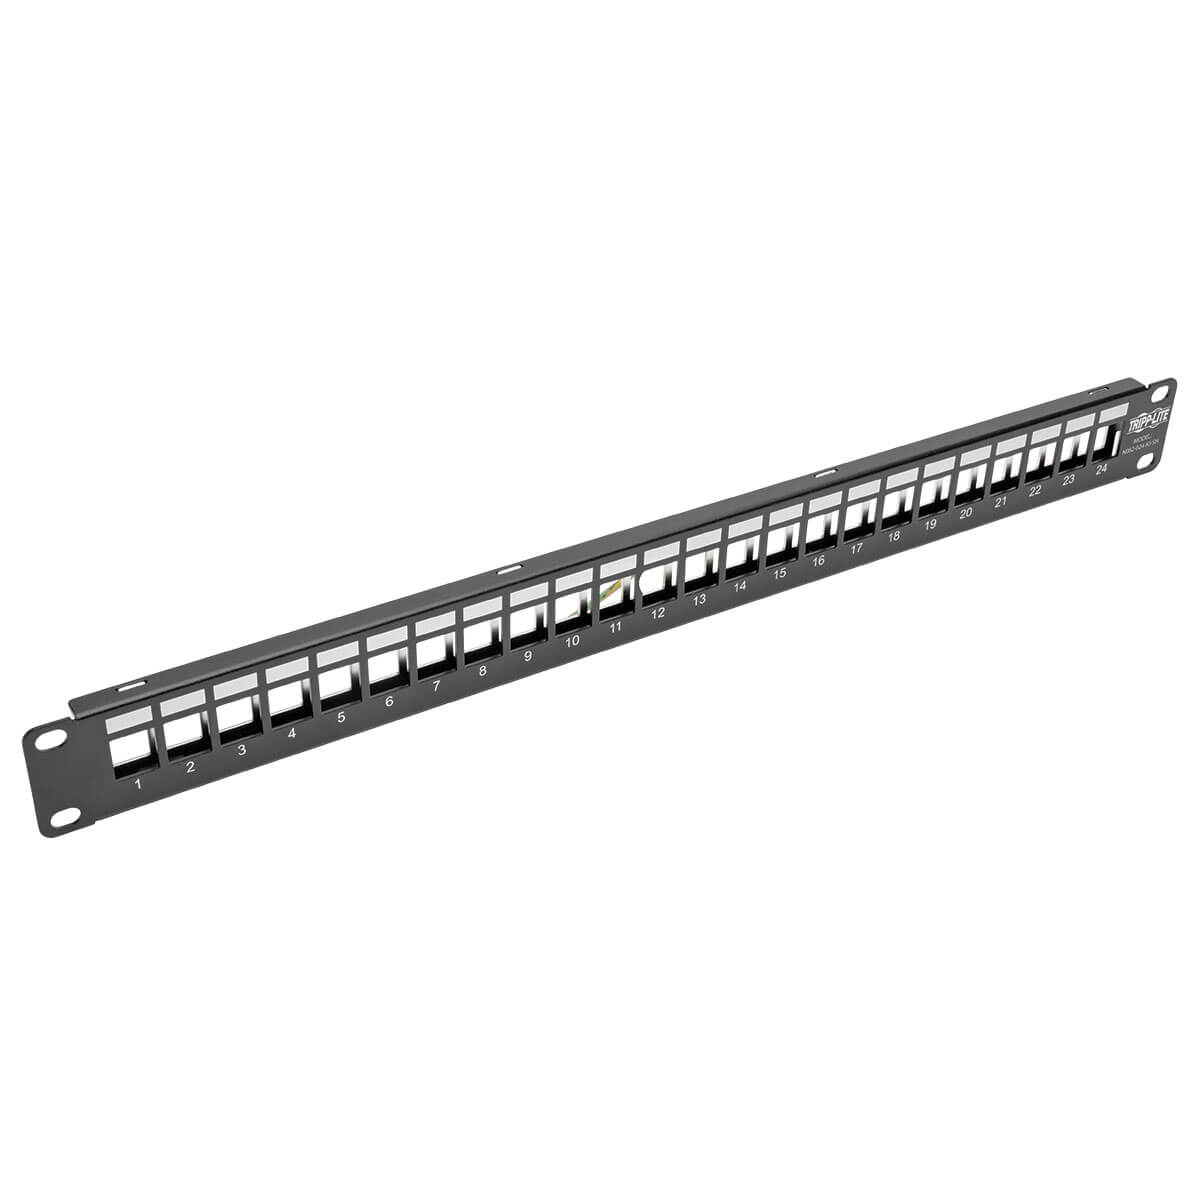 Tripp Lite 24-Port 1U Rack-Mount Shielded Blank Keystone/Multimedia Patch Panel, RJ45 Ethernet, USB, HDMI, Cat5e/6